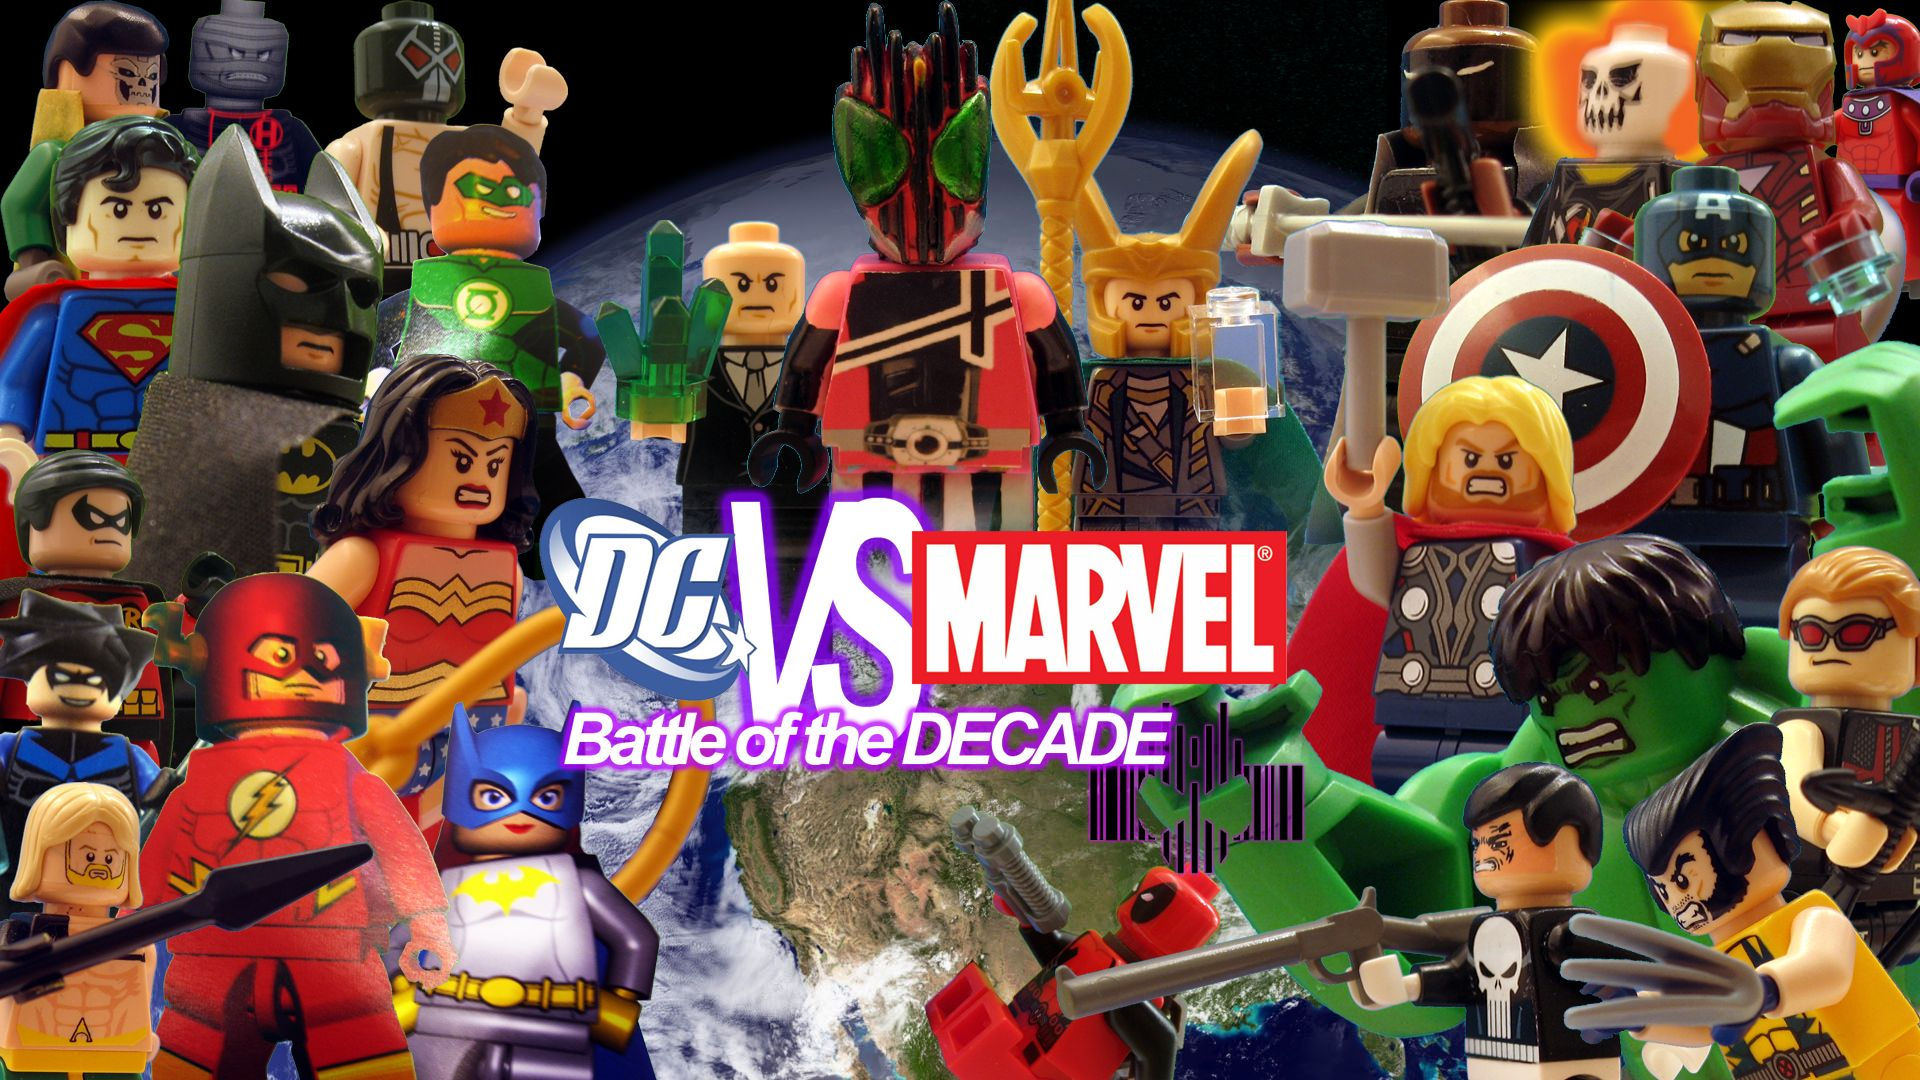 Lego dc vs marvel google keress lego i pinterest marvel lego marvel super heroes inch plastic poster waterproof anti fade can use on outdoorgardenbathroom voltagebd Image collections